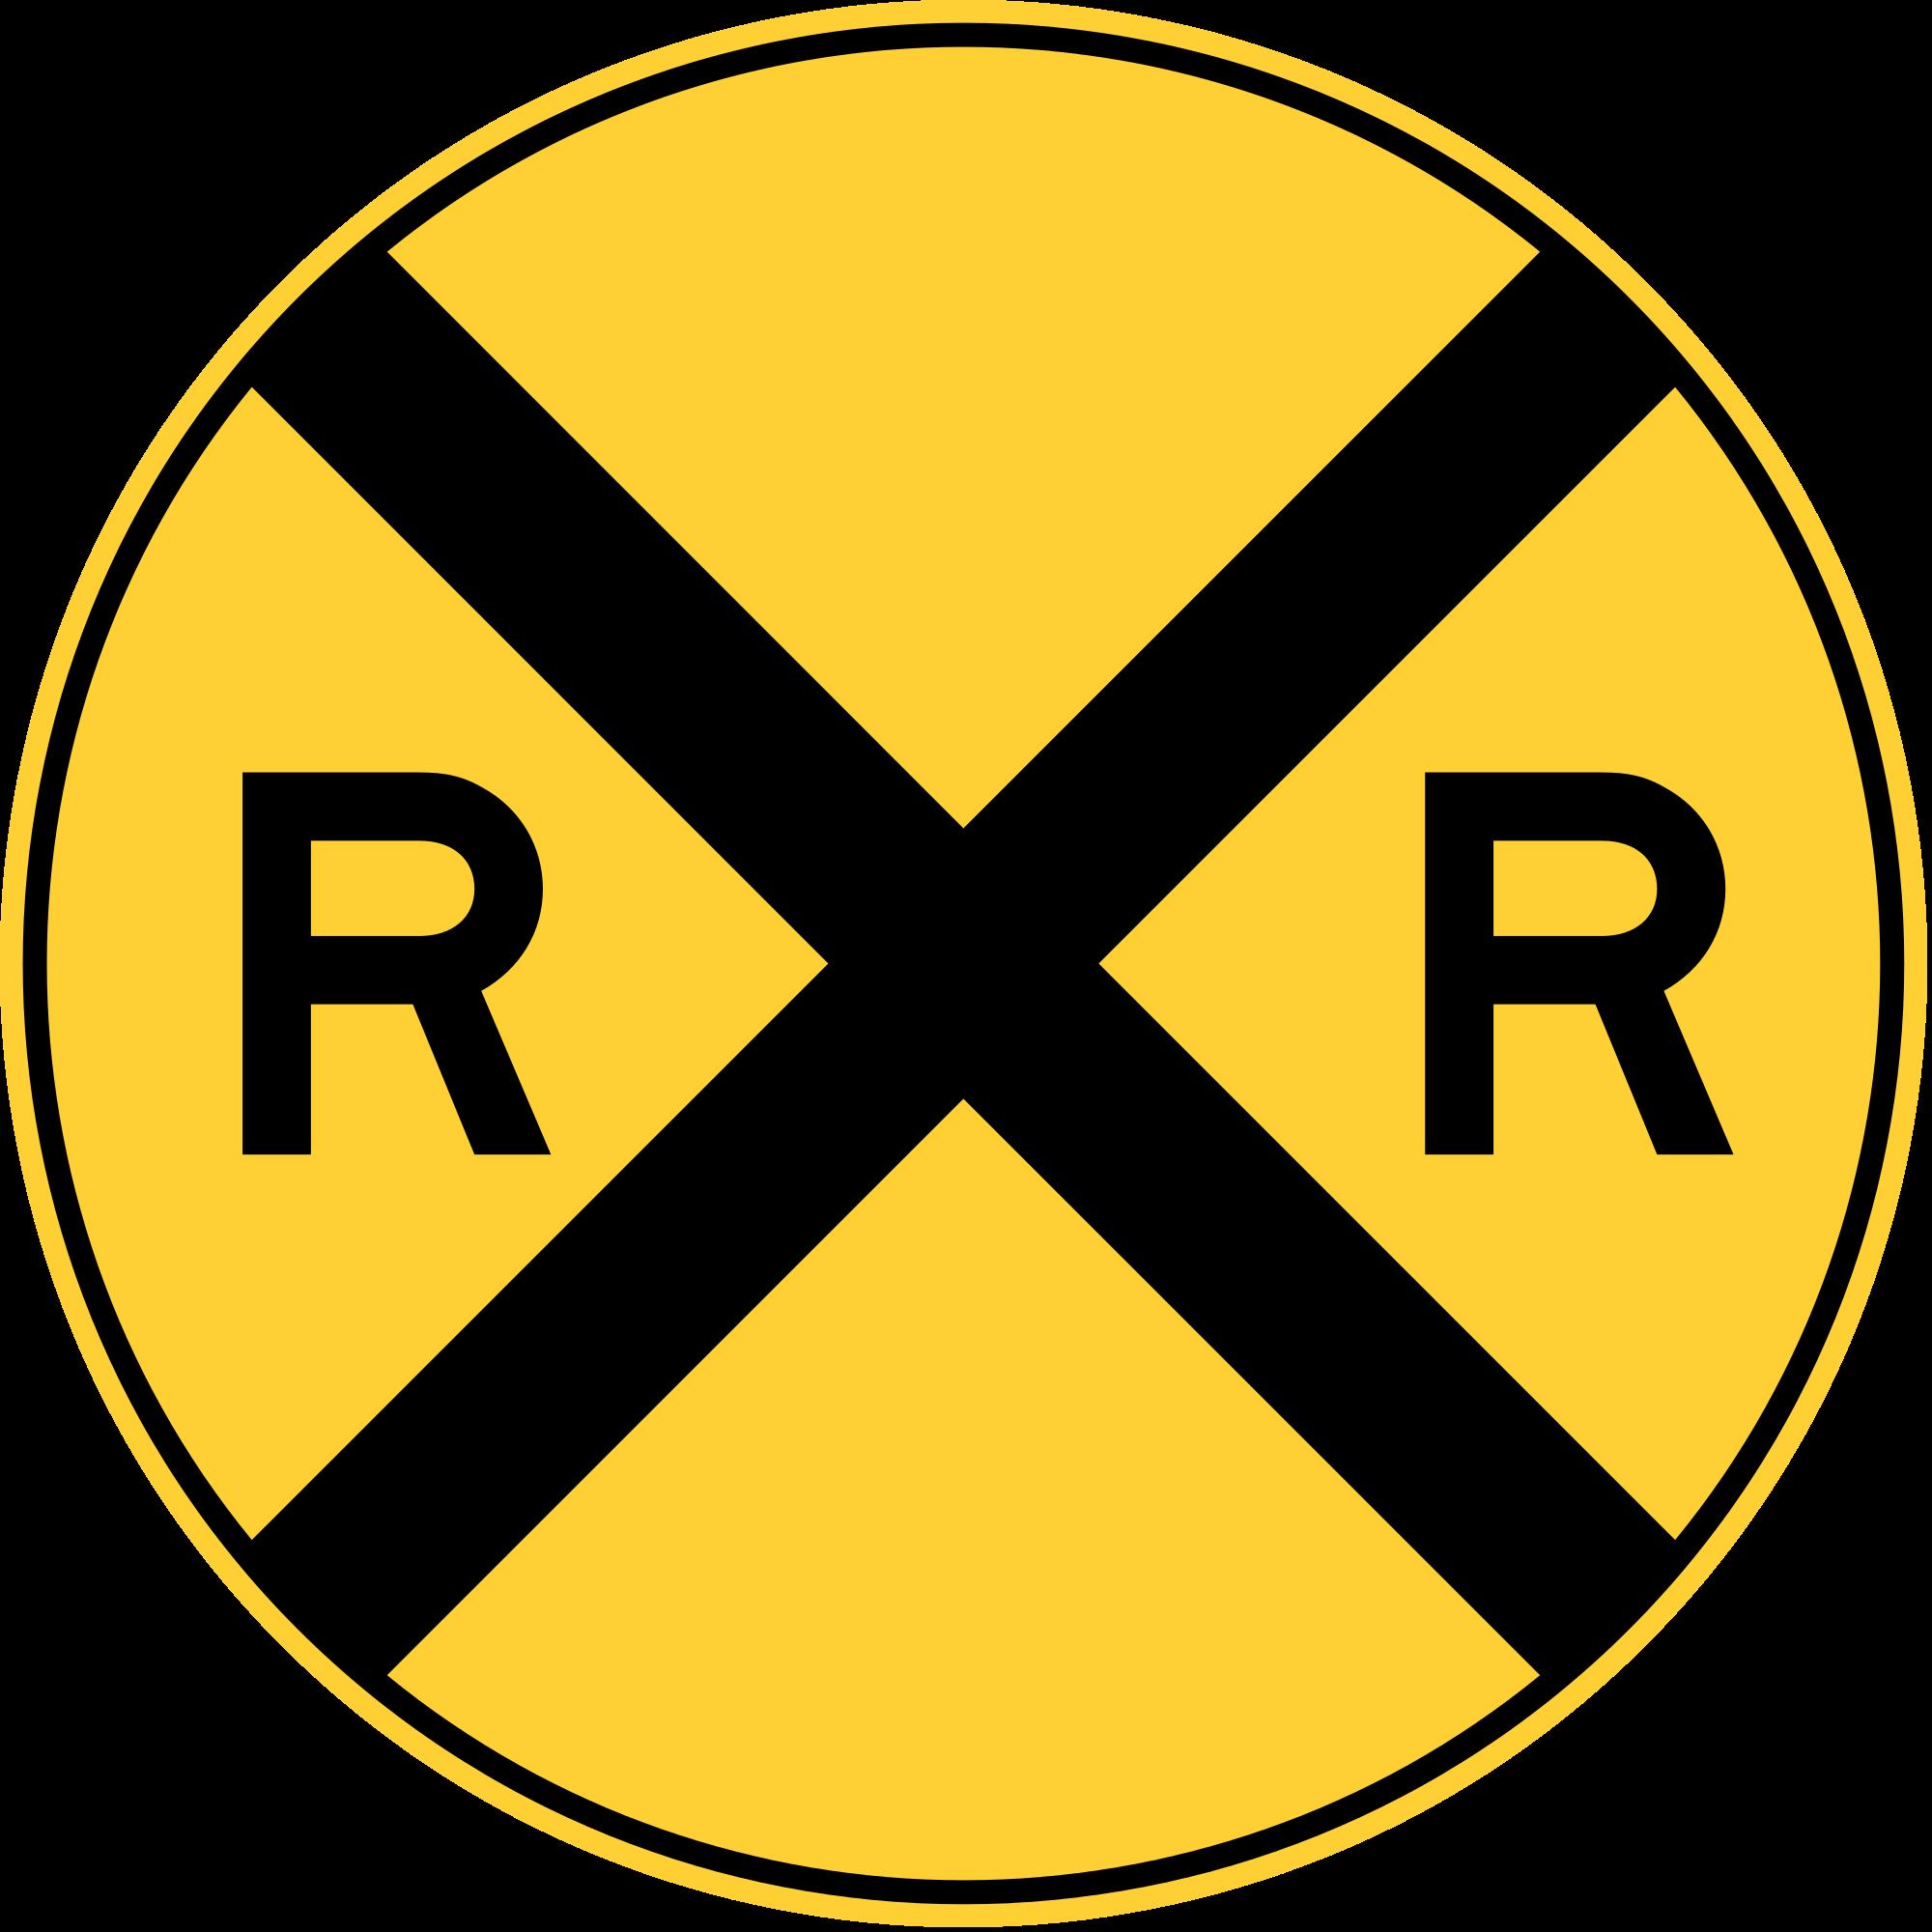 Railroad svg #10, Download drawings